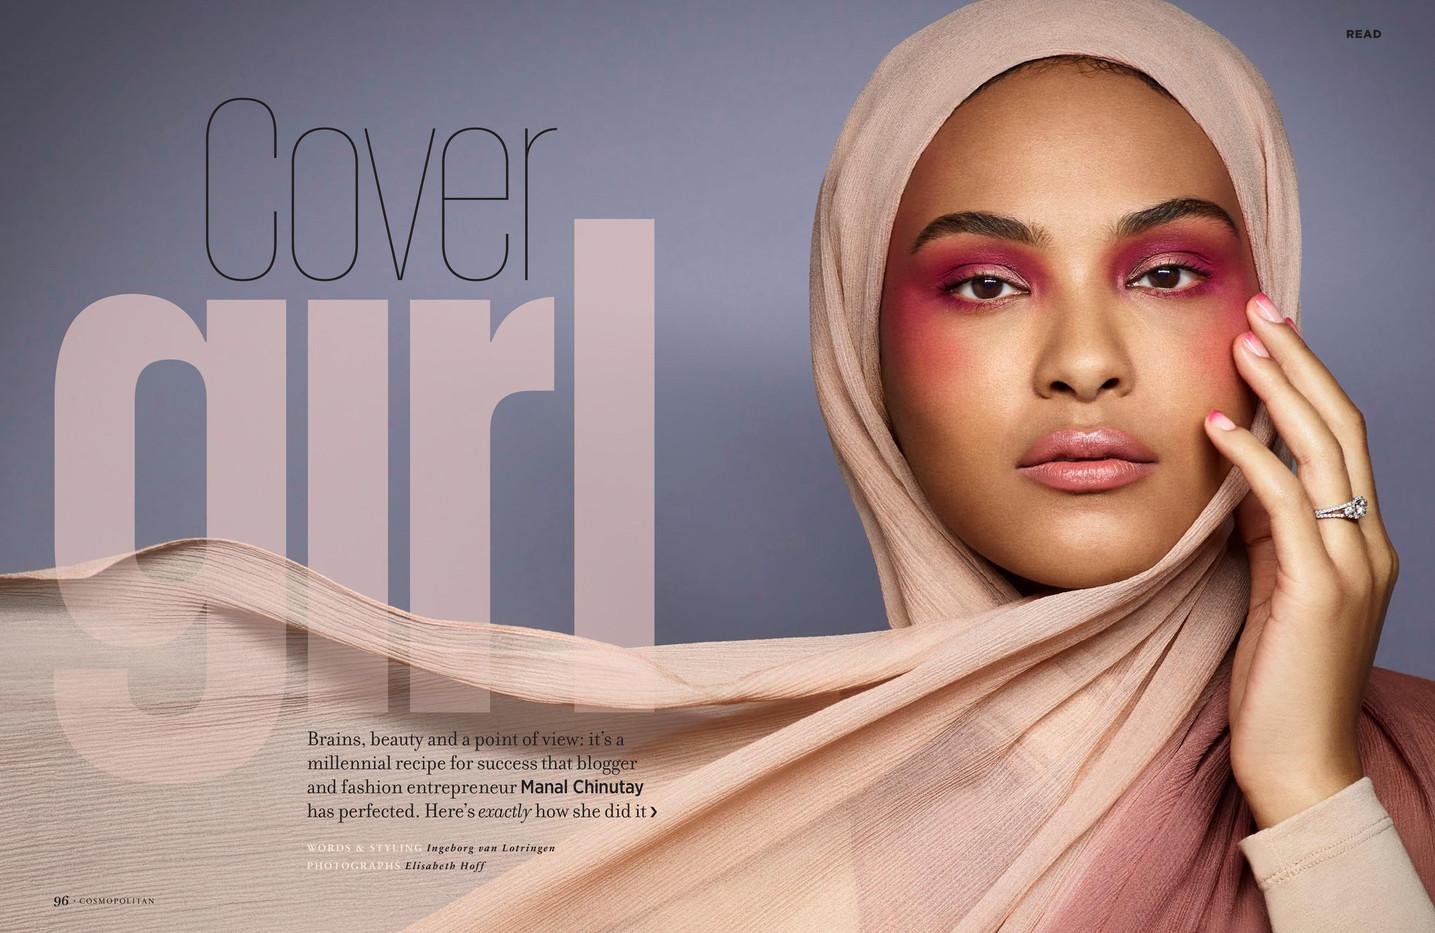 Cover girl – Cosmopolitan